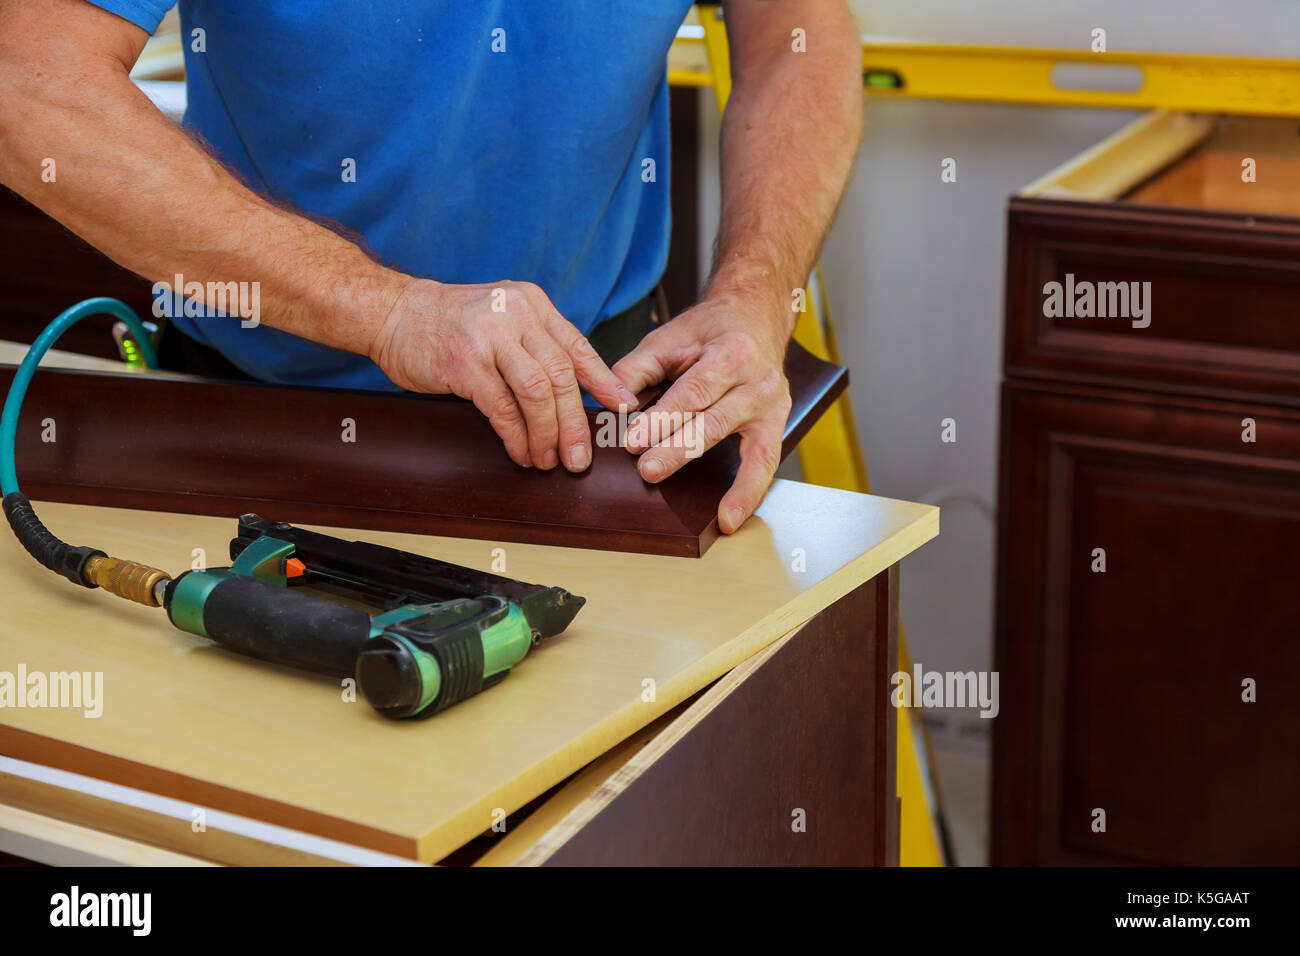 Carpenter Using Nail Gun Imágenes De Stock & Carpenter Using Nail ...